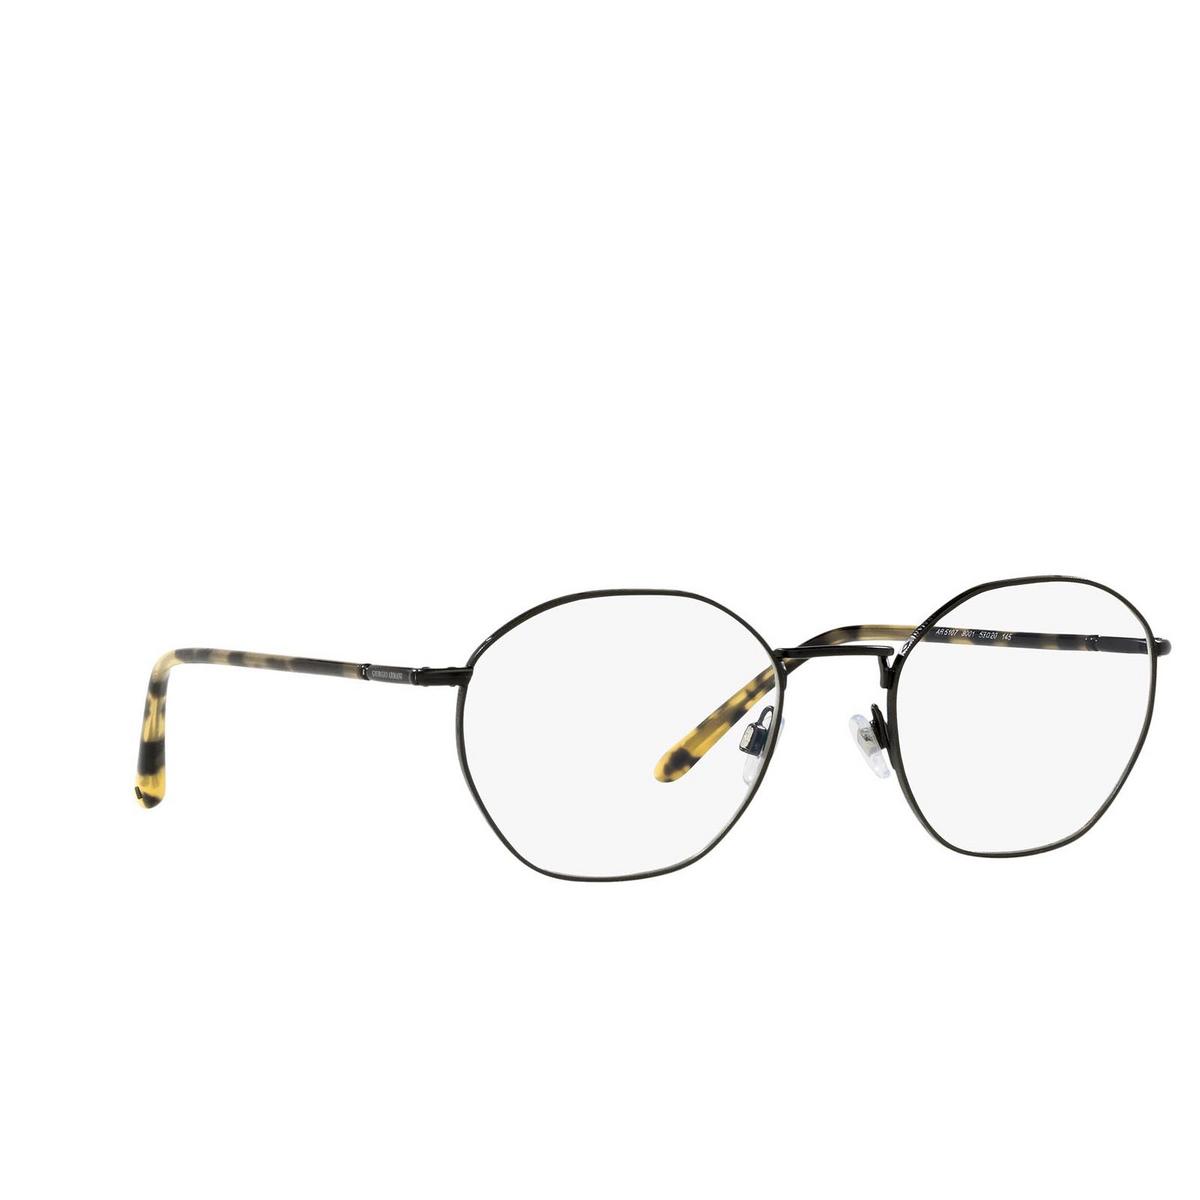 Giorgio Armani® Square Eyeglasses: AR5107 color Matte Black 3001 - three-quarters view.